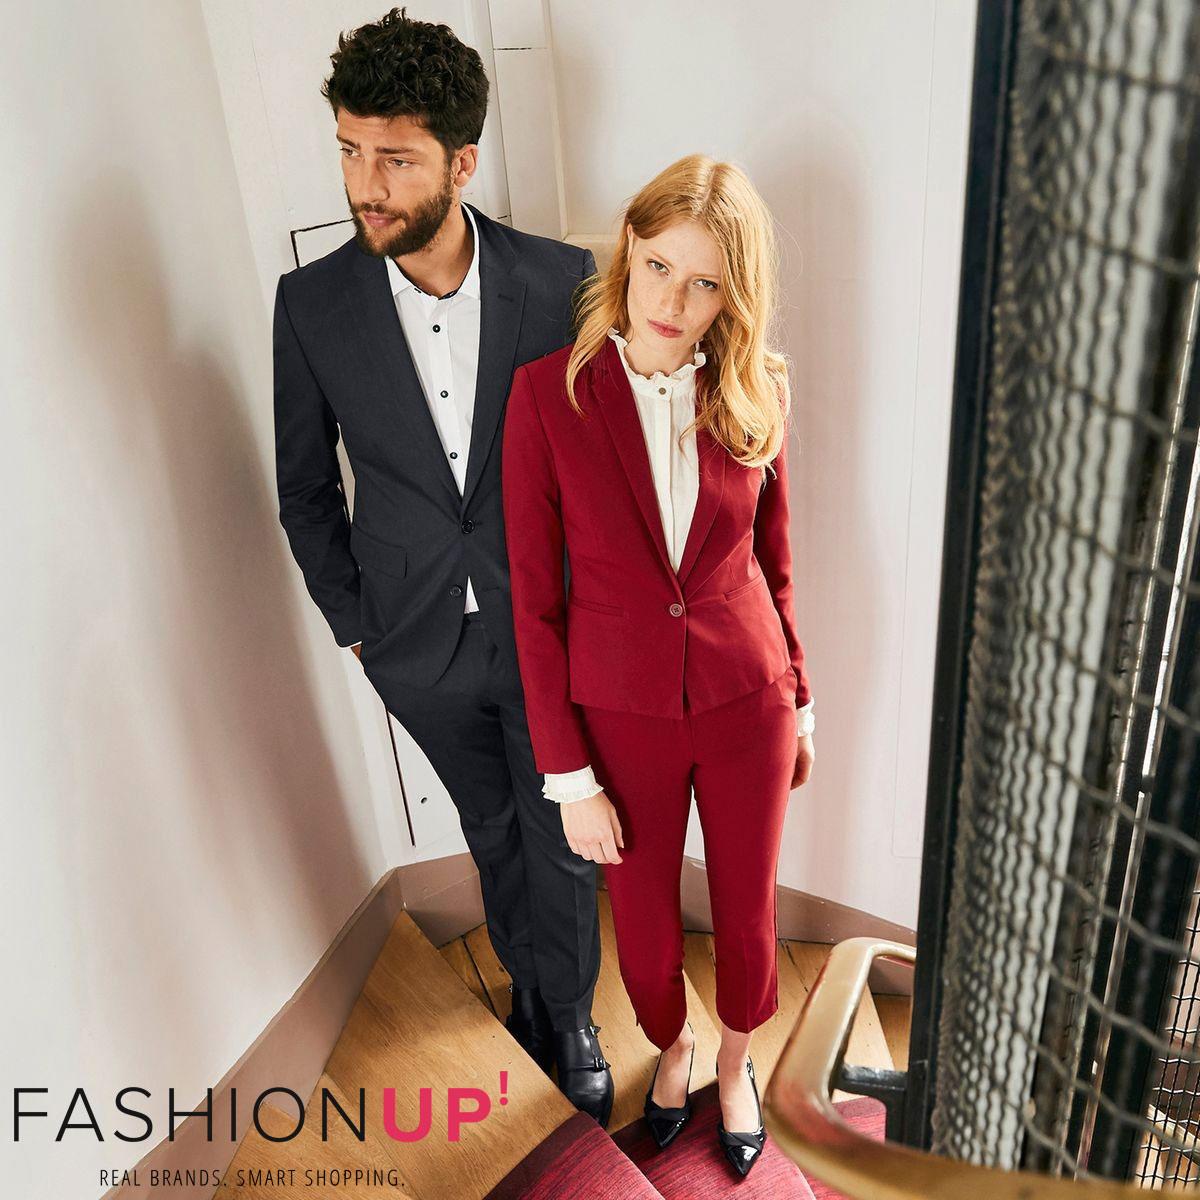 Black Friday FashionUP 2018